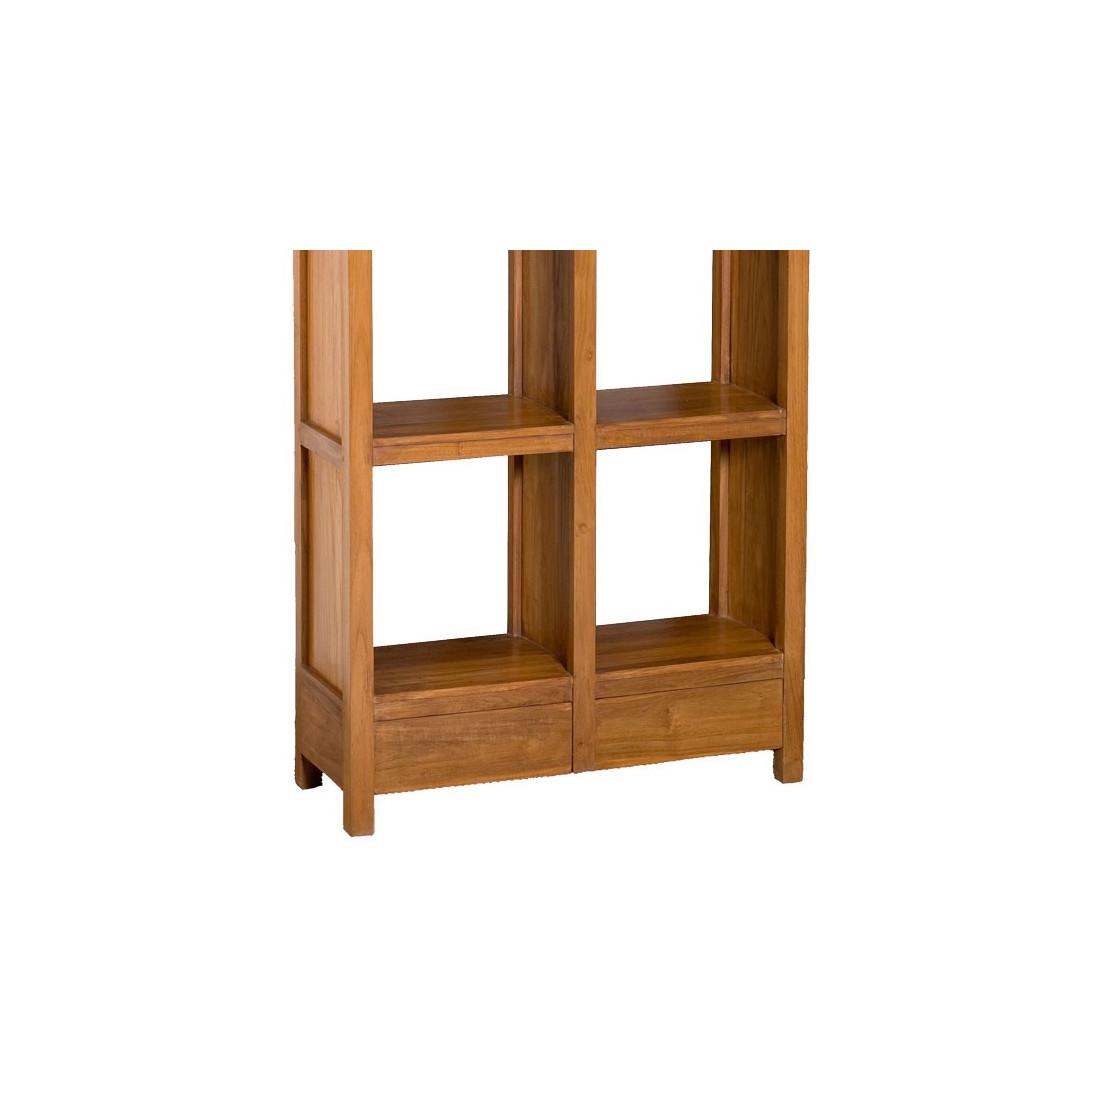 etag re 8 cases 2 tiroirs pias univers petits meubles. Black Bedroom Furniture Sets. Home Design Ideas